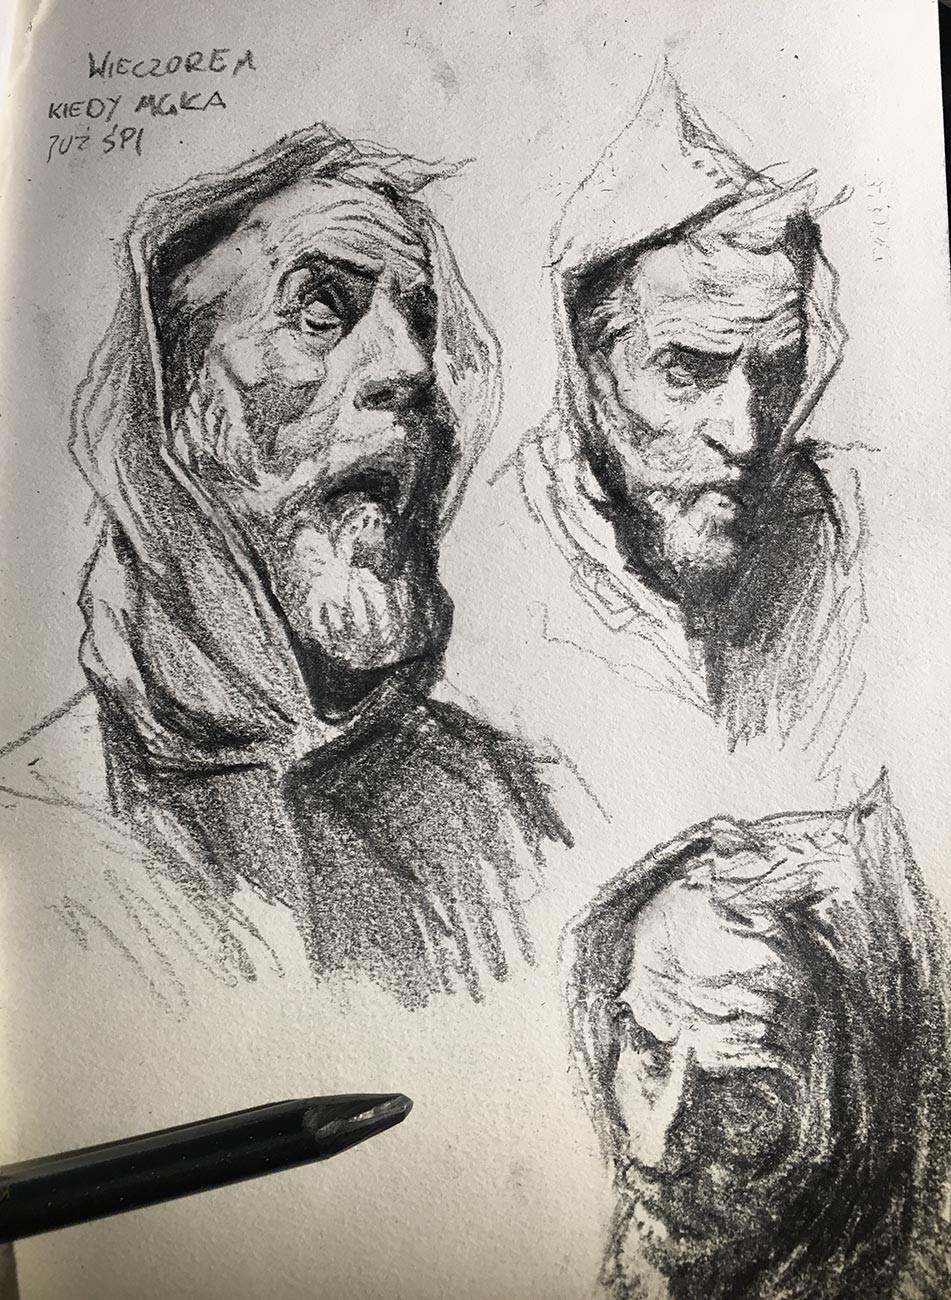 Artstation - Spanish Inquisition Sketch Tomek Larek